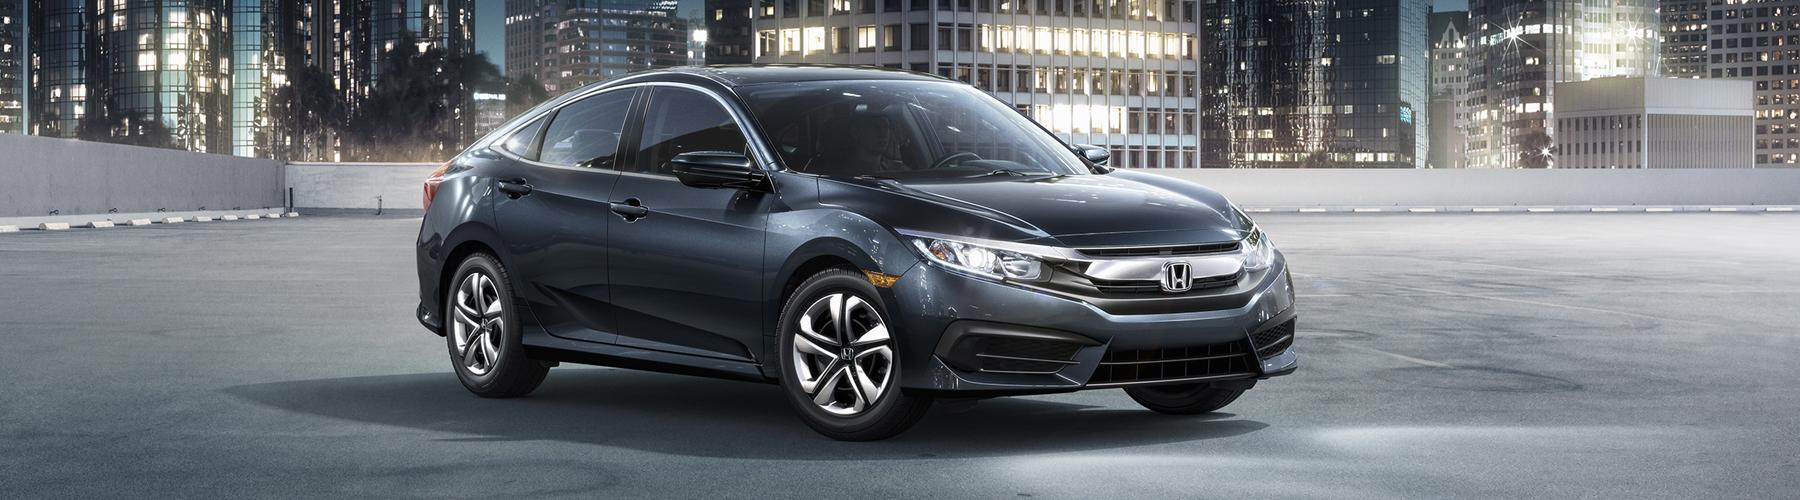 2016 Honda Civic Sedan Metro Milwaukee Honda Dealers